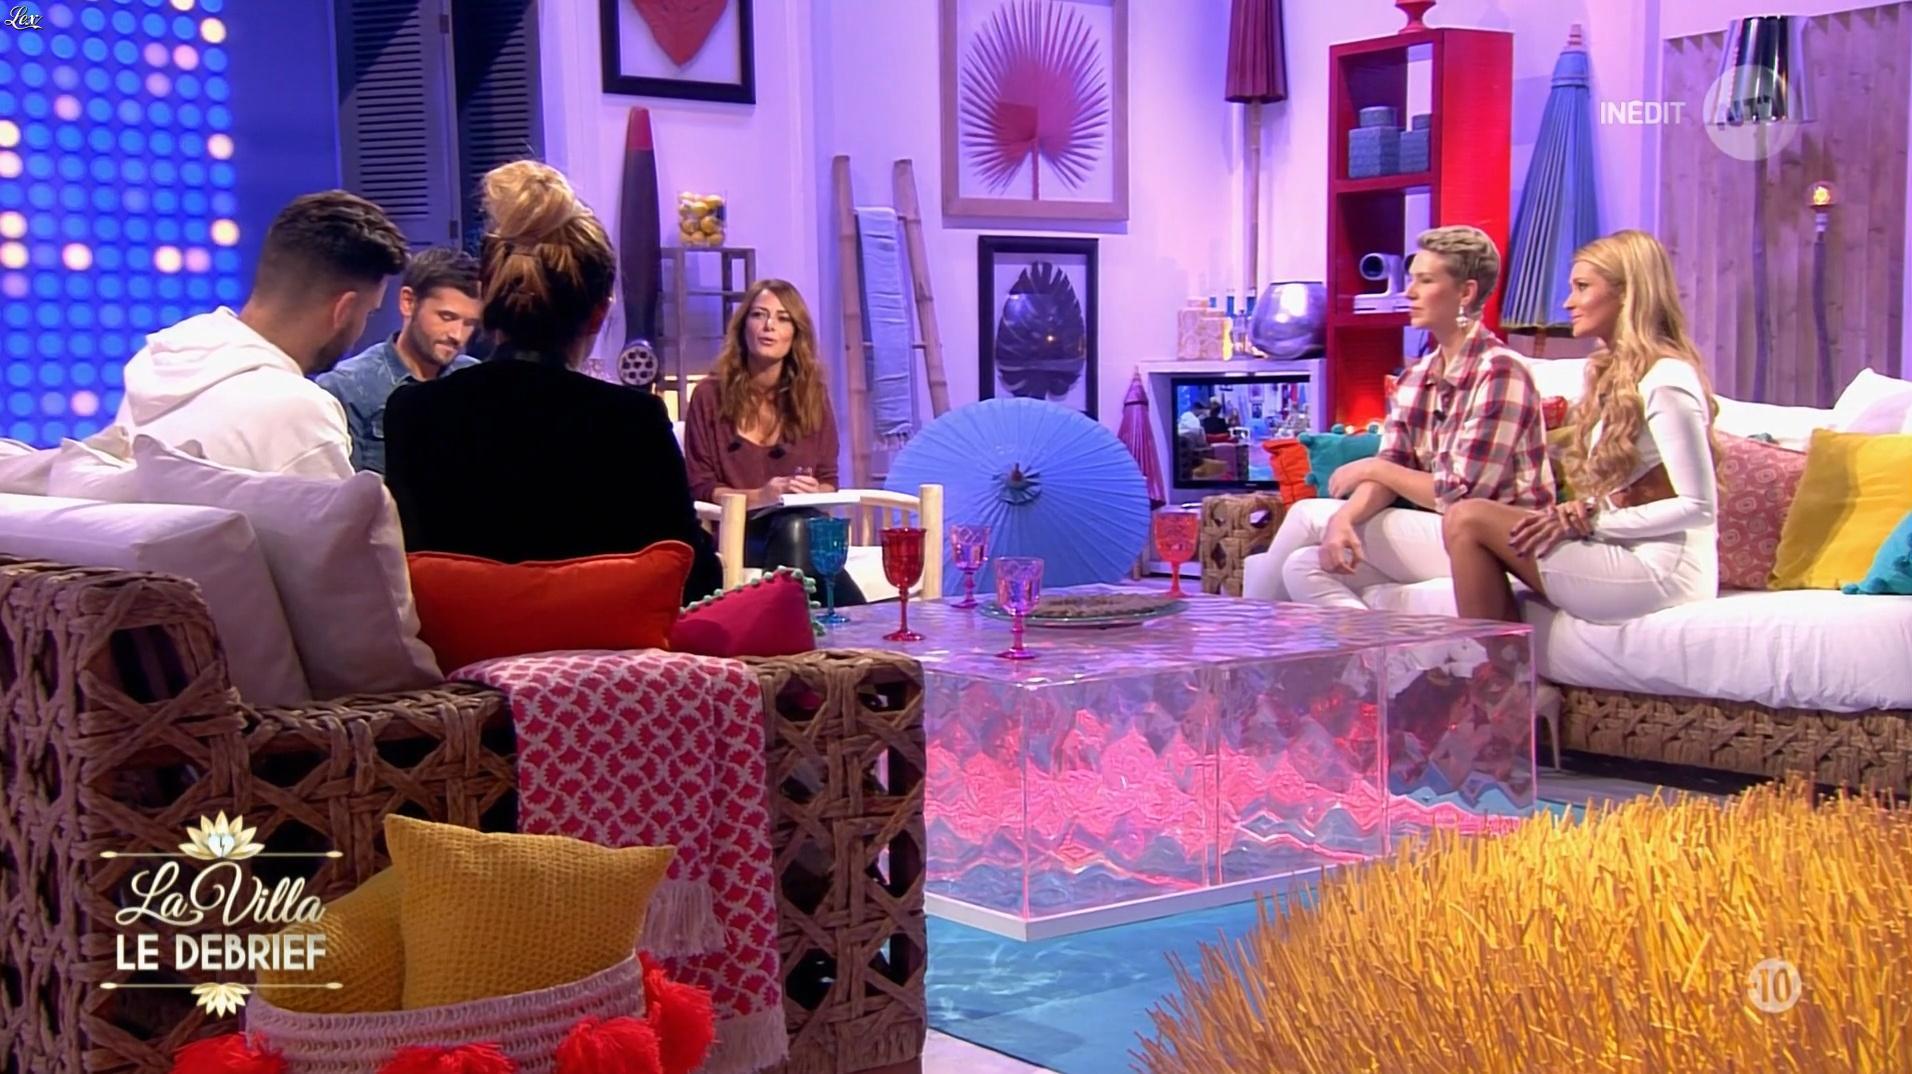 Elsa Fayer et Tatiana Laurens Delarue dans la Villa le Debrief. Diffusé à la télévision le 22/12/16.